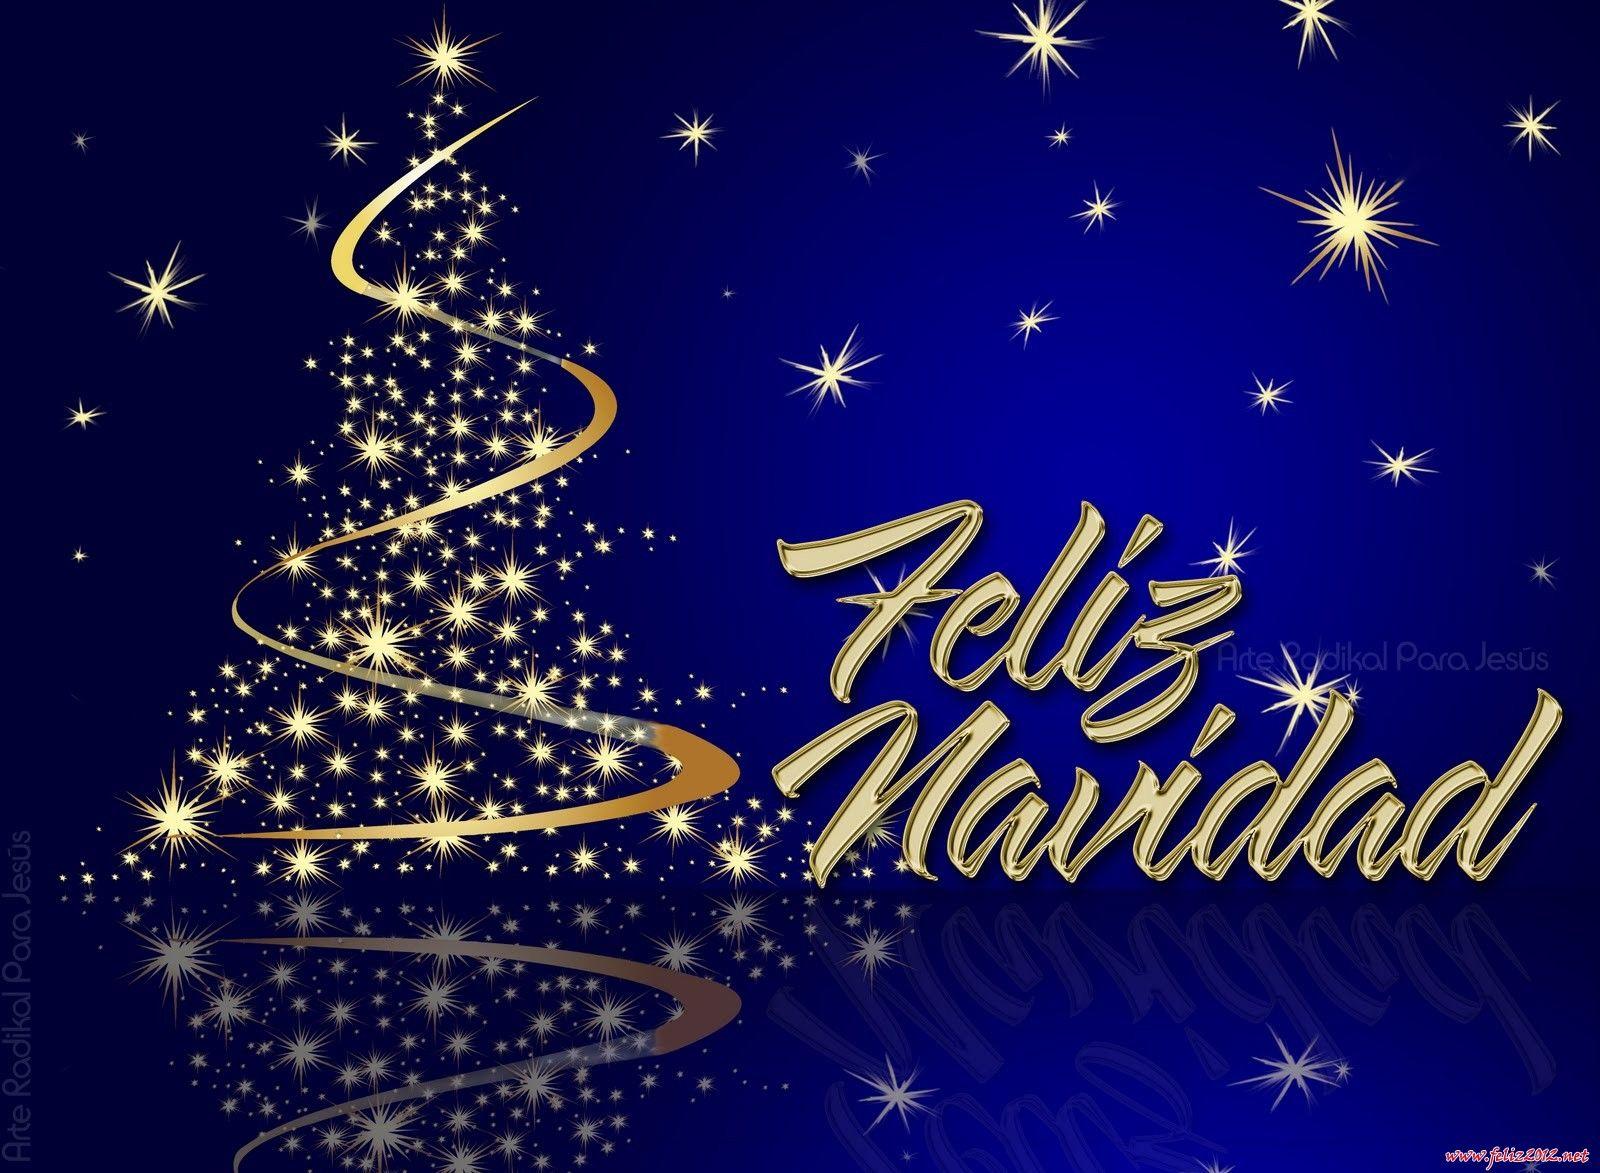 Feliz Navidad Tarjetas Feliz Navidad Felicitaciones Navidad Feliz Navidad